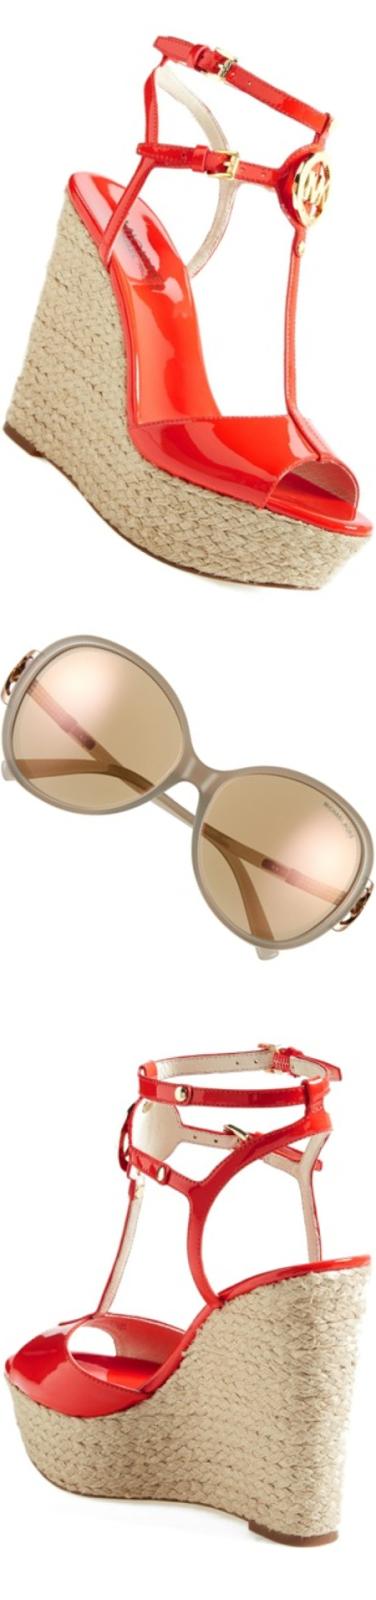 Michael Kors Collection 58mm Pavé Stone Sunglasses